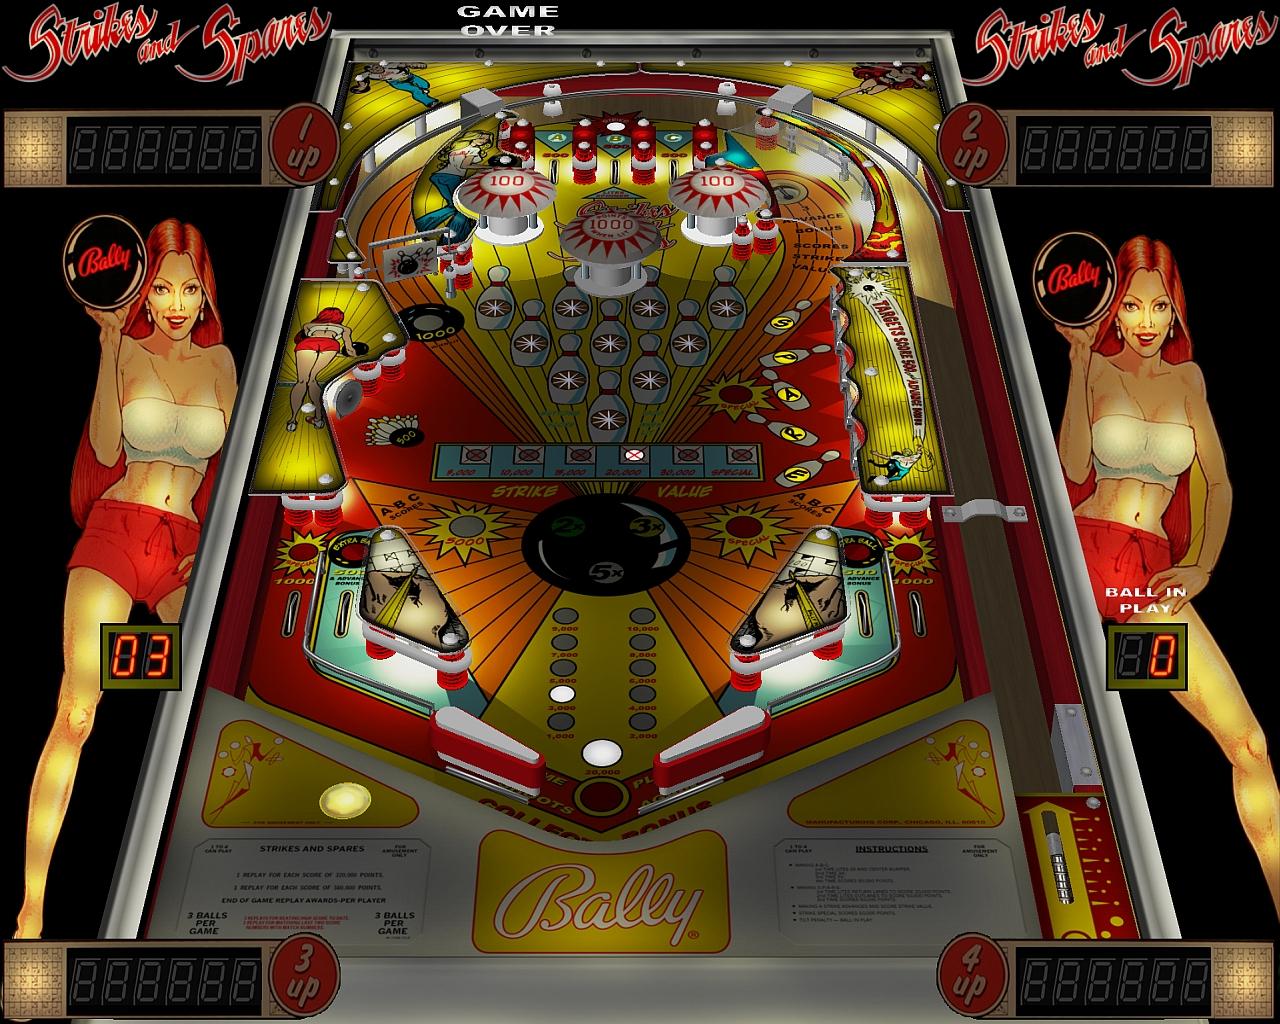 Computer Pinball: Visual Pinball Screen Shots: Classics 2